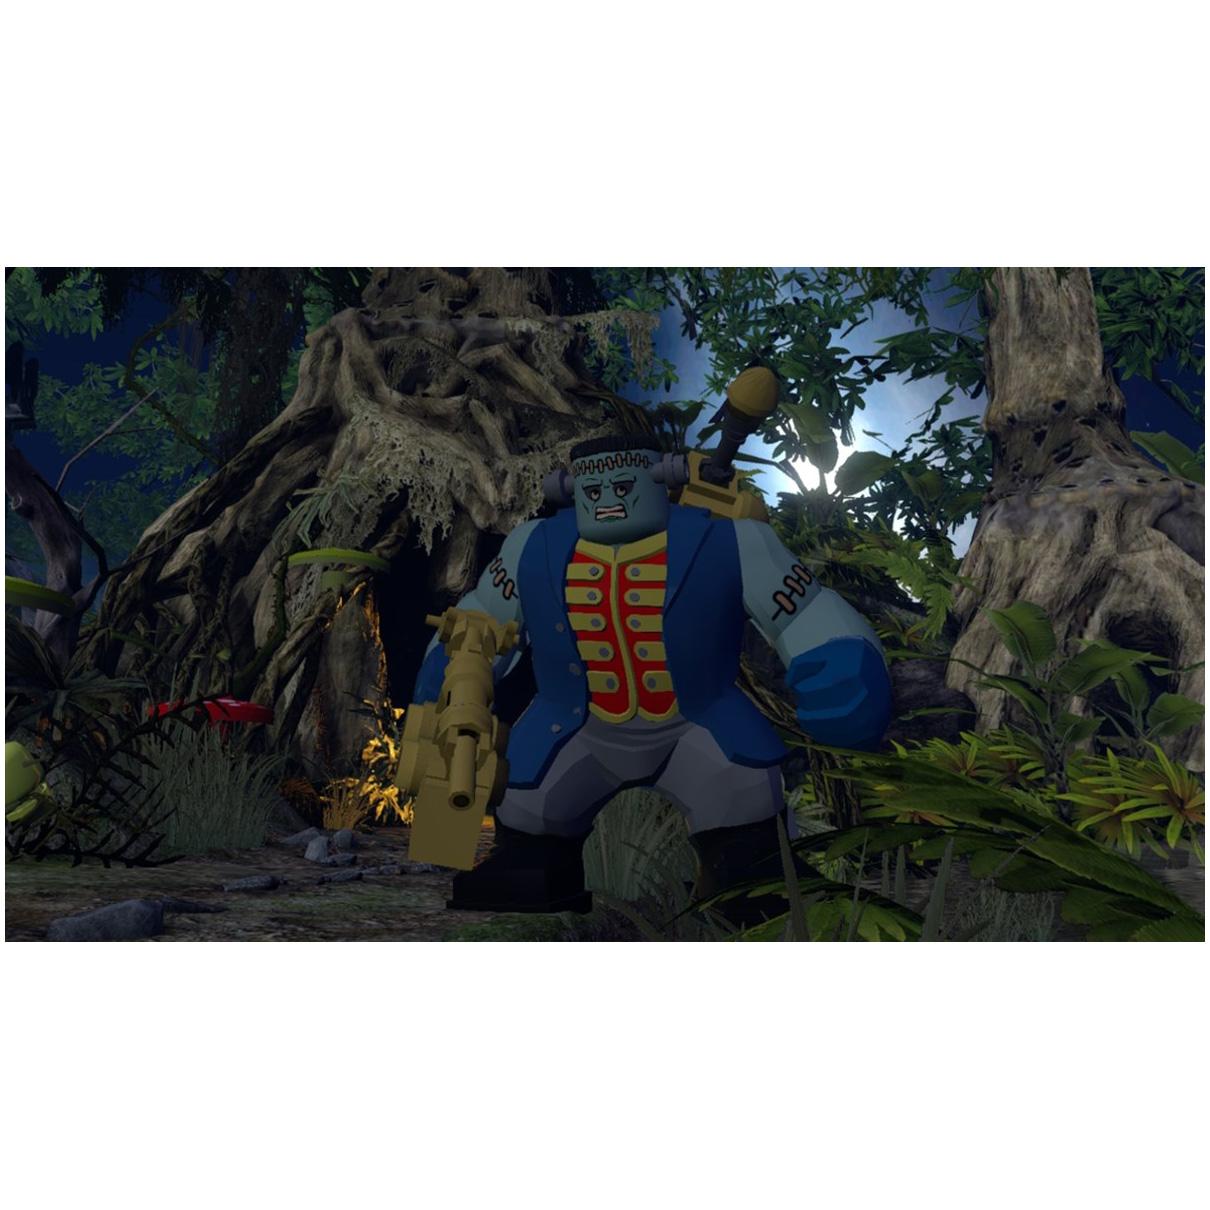 Joc Lego Batman 3: Beyond Gotham HITS pentru PlayStation 4 2